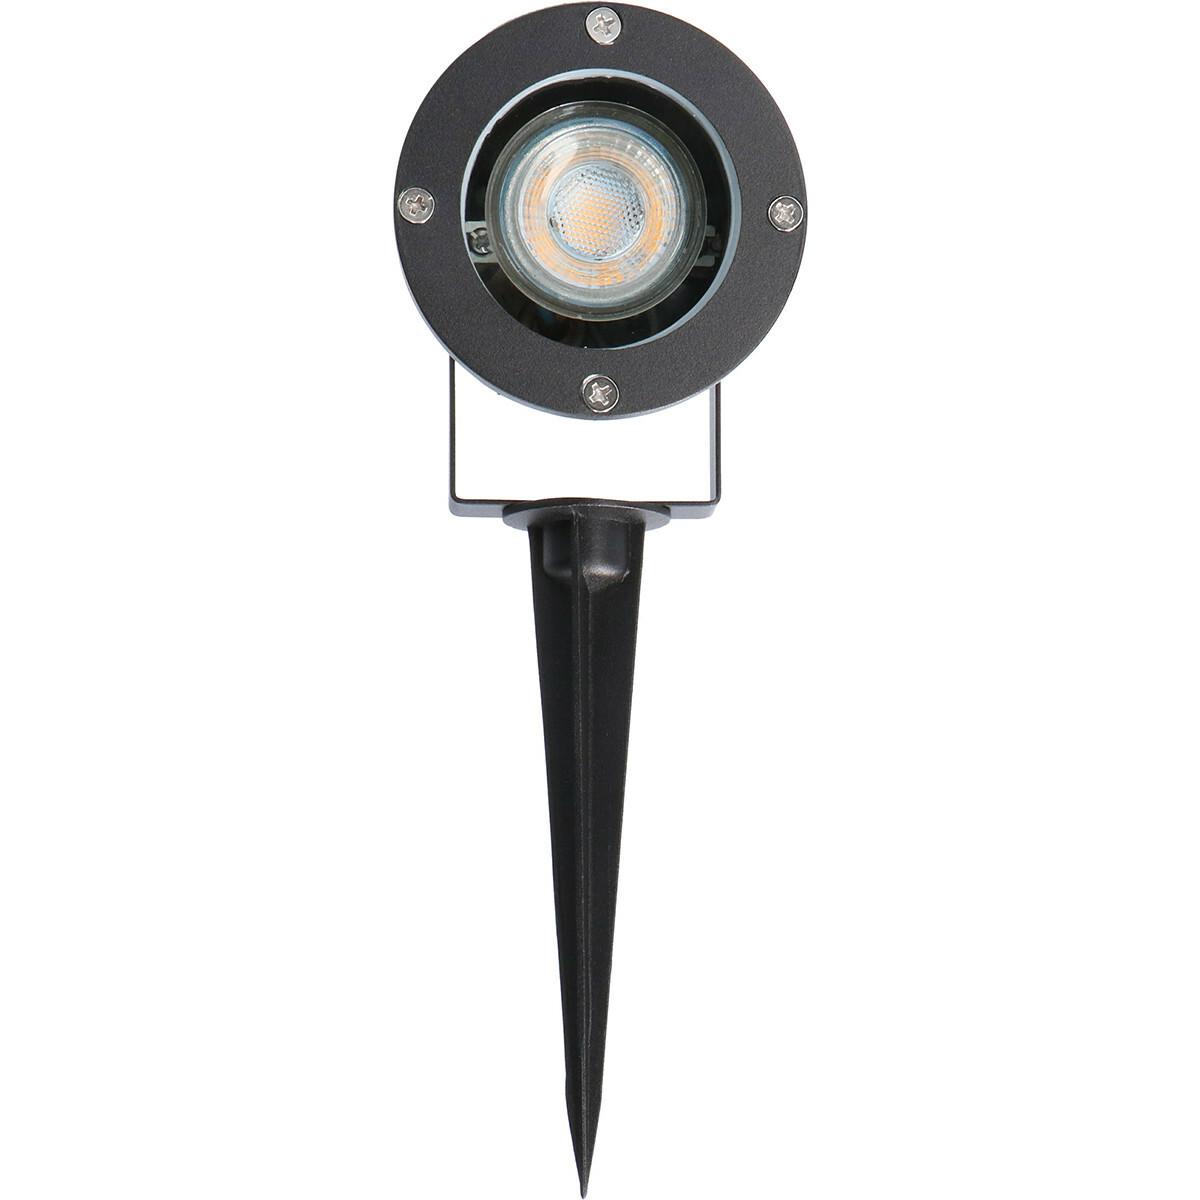 PHILIPS - Prikspot met Stekker - CorePro 840 36D - Sanola Urbun - GU10 Fitting - Dimbaar - 5W - Natu